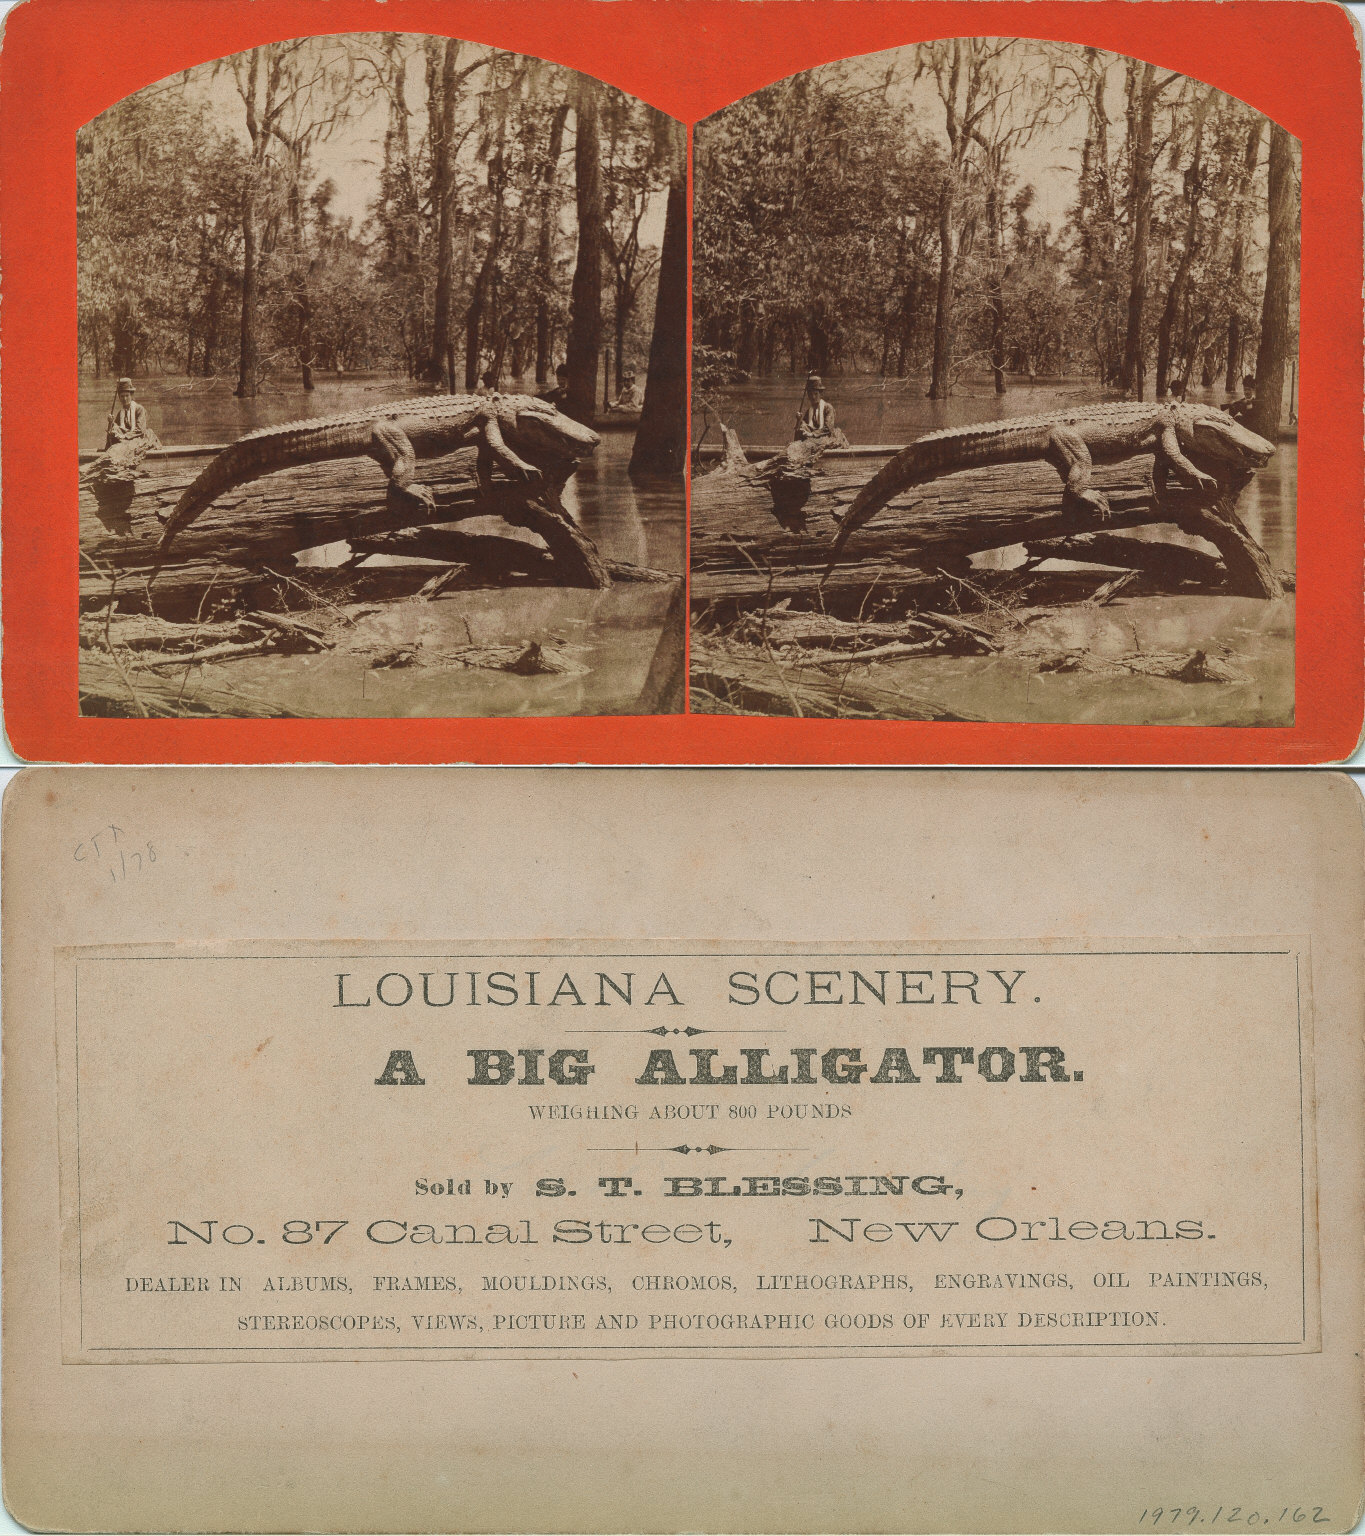 A big alligator